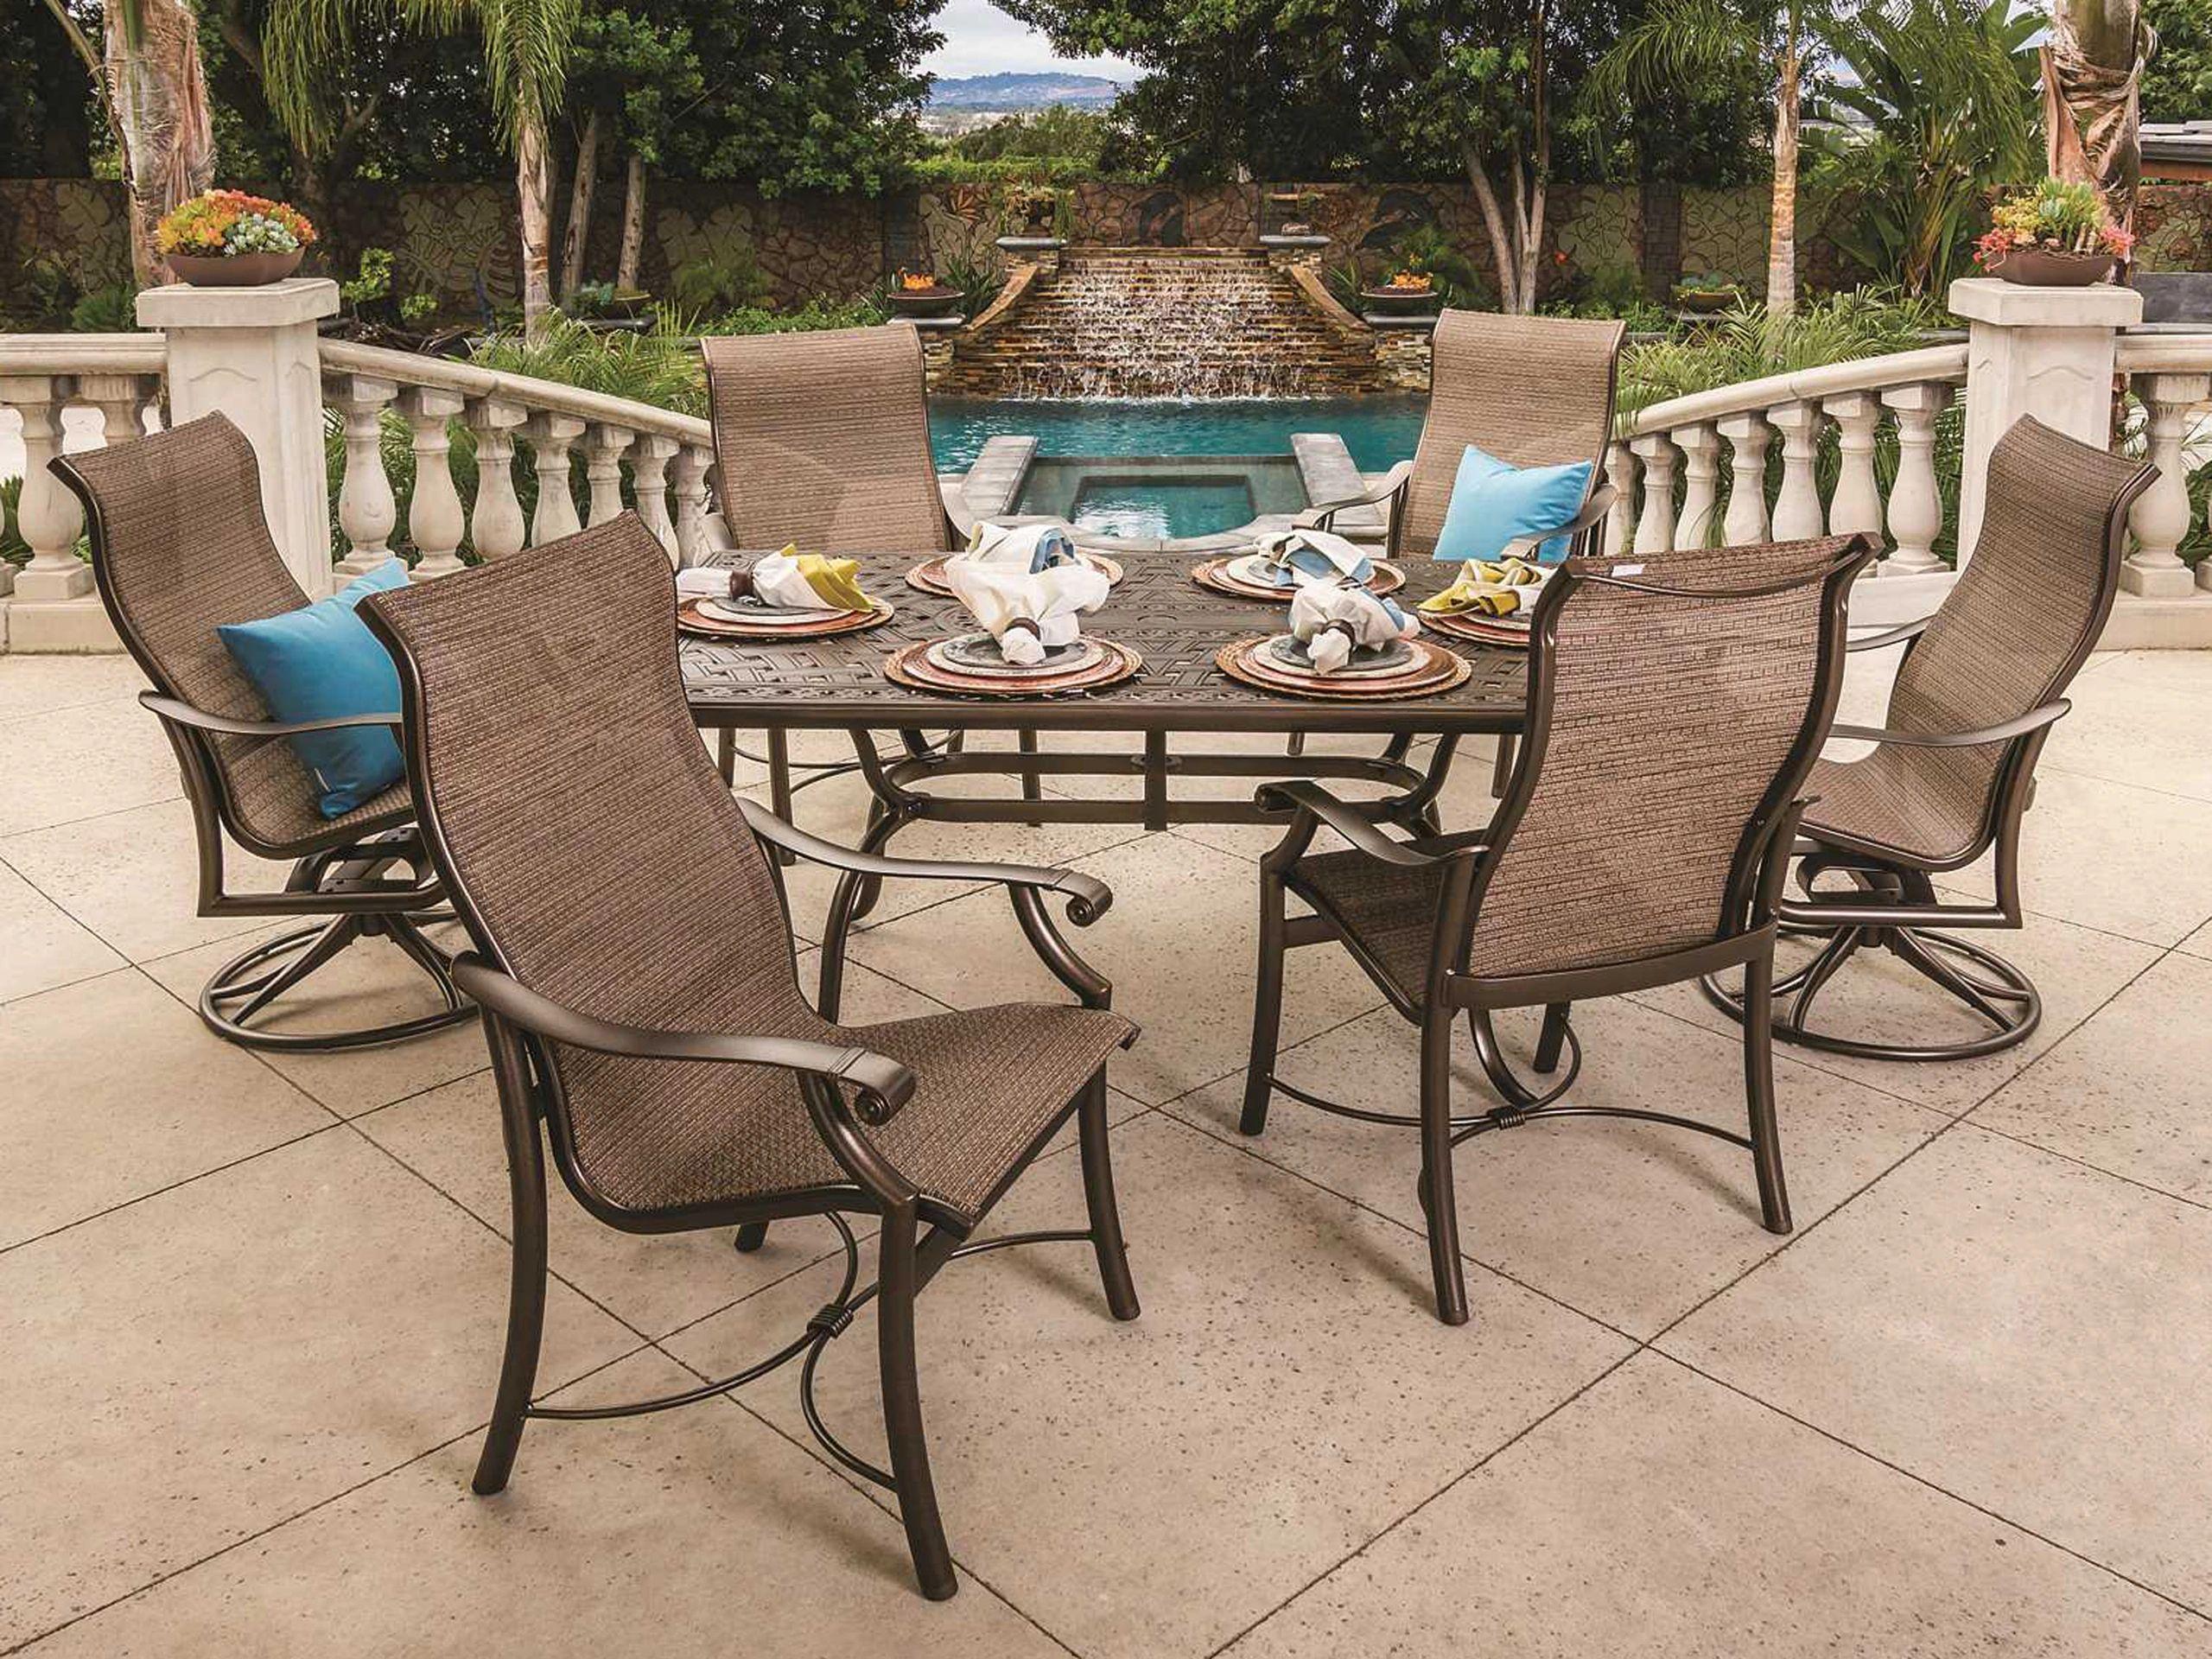 Palm Casual Patio Furniture Tampa.Casual Furniture Repair And Sales